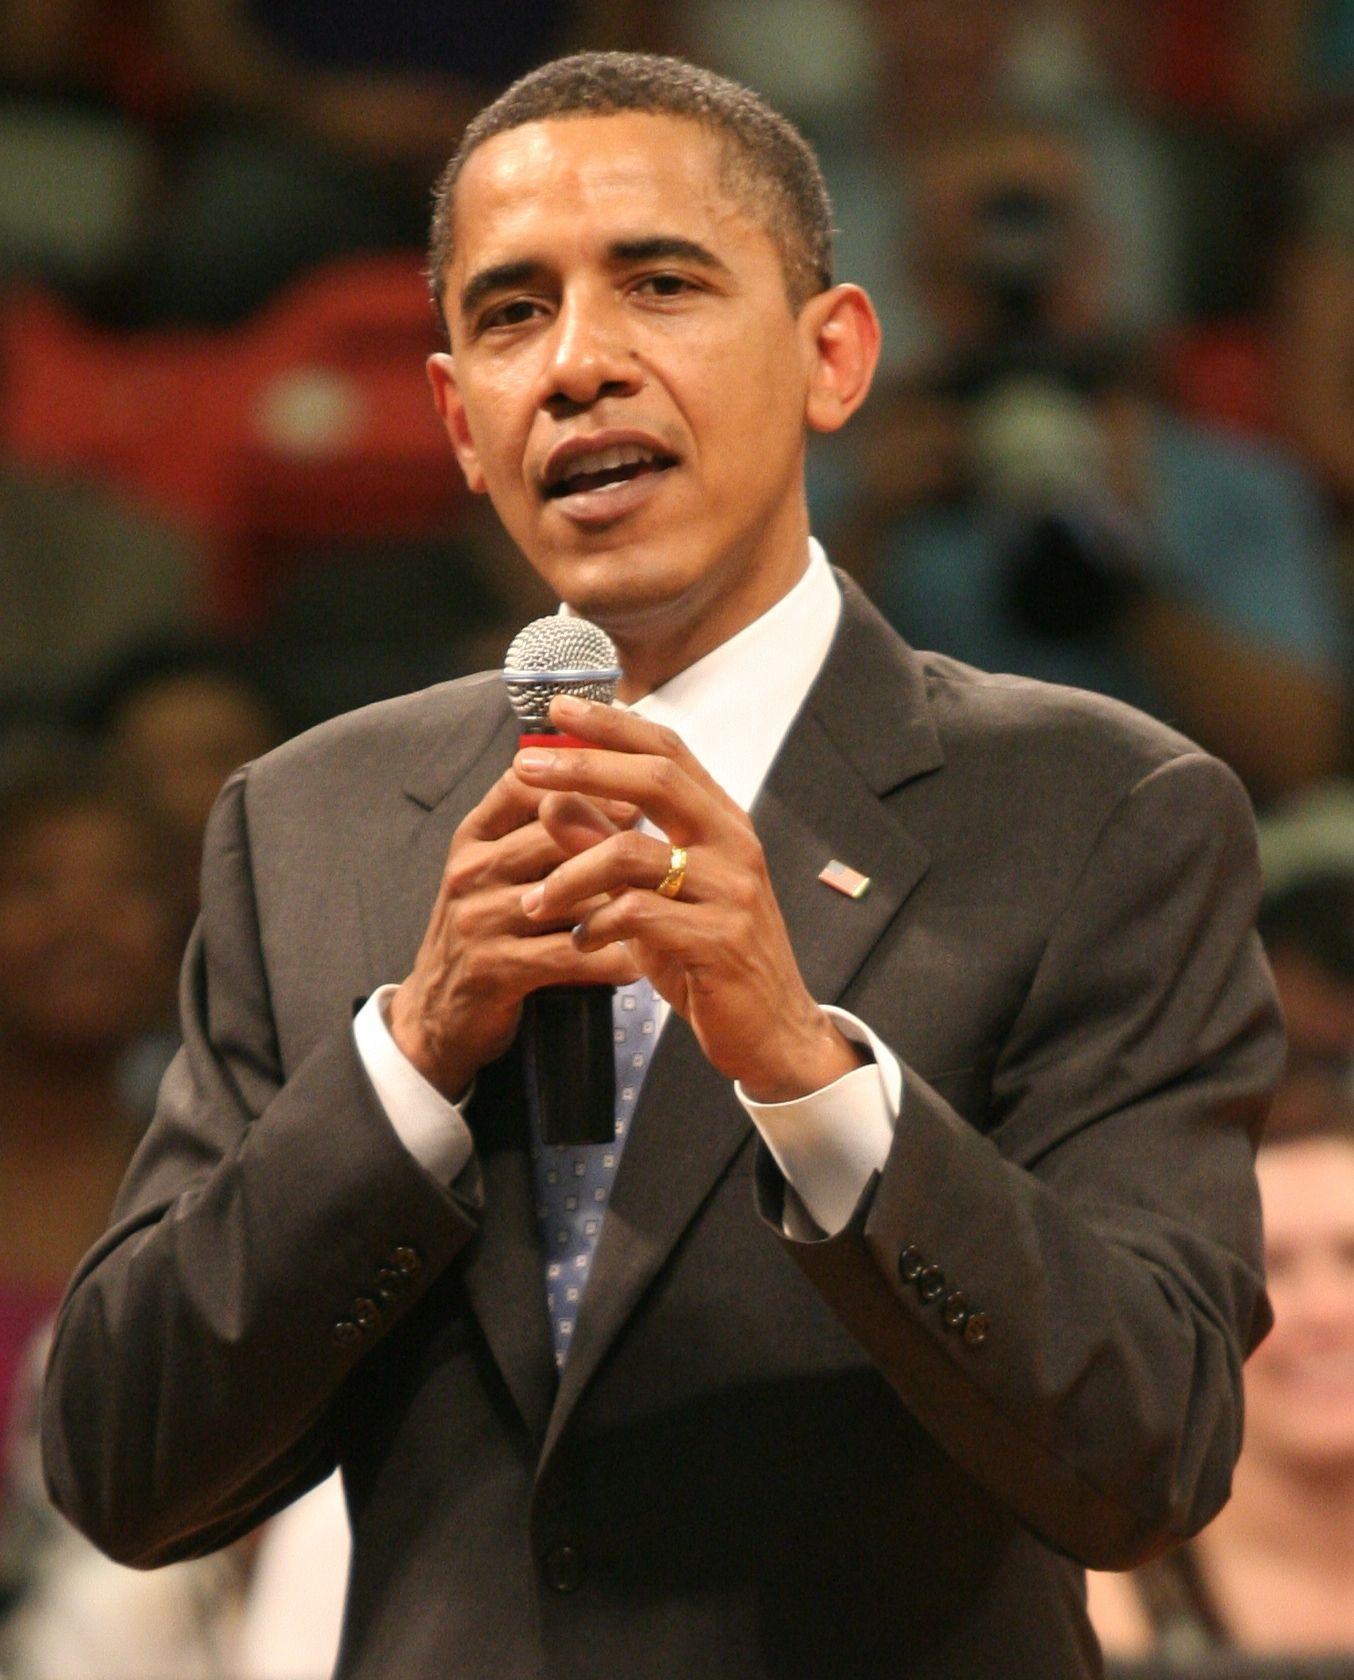 Obama student loan forgiveness